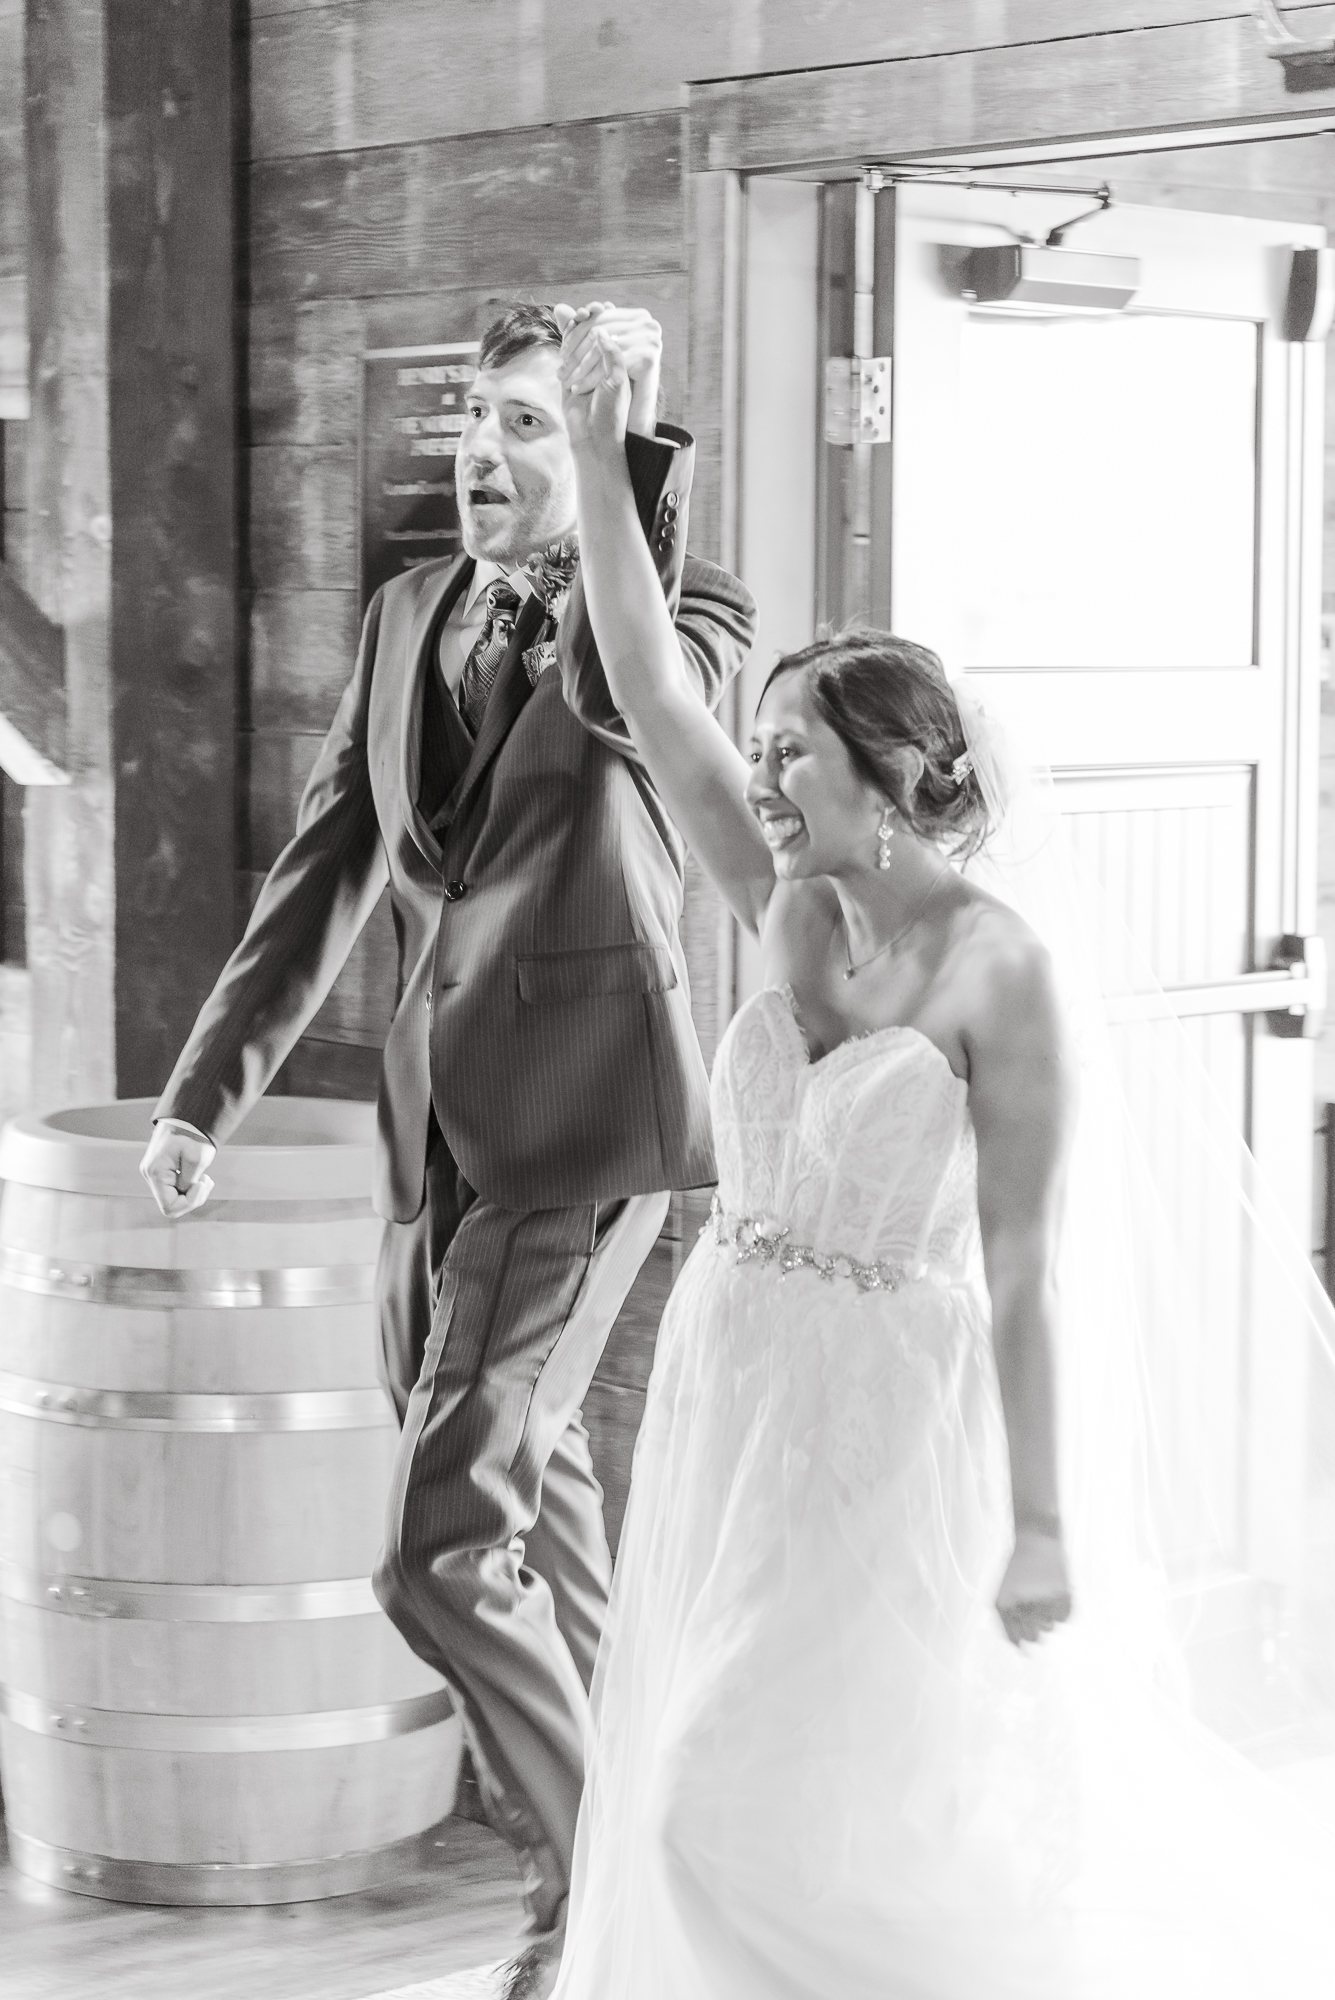 Maria+Adam_Summer Barn Wedding_The Barn at The North Star Preserve_Oberlin_Ohio-181.jpg